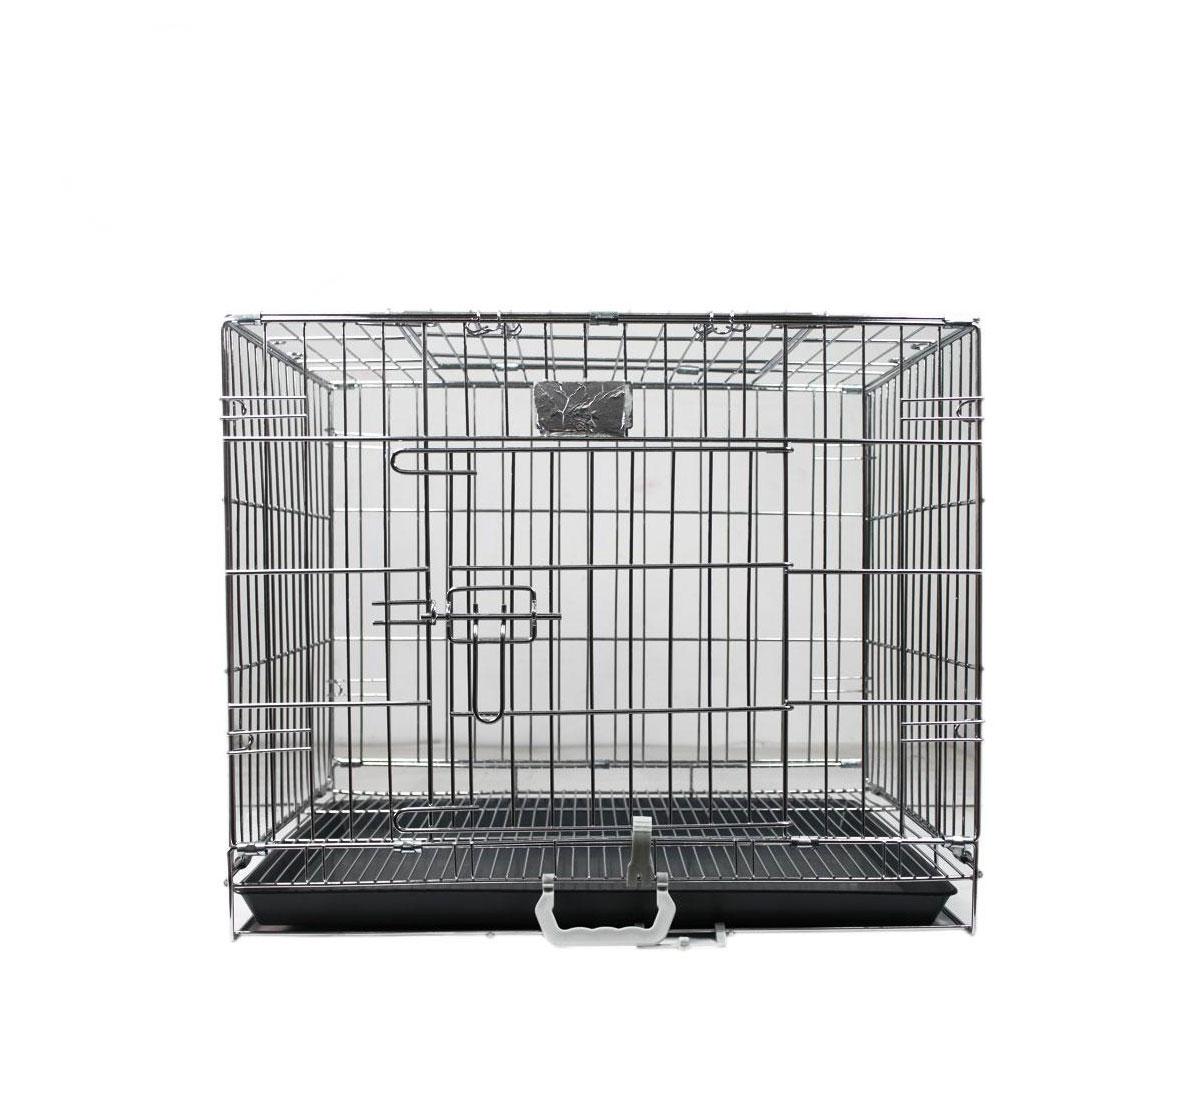 Dog cage online shopping india